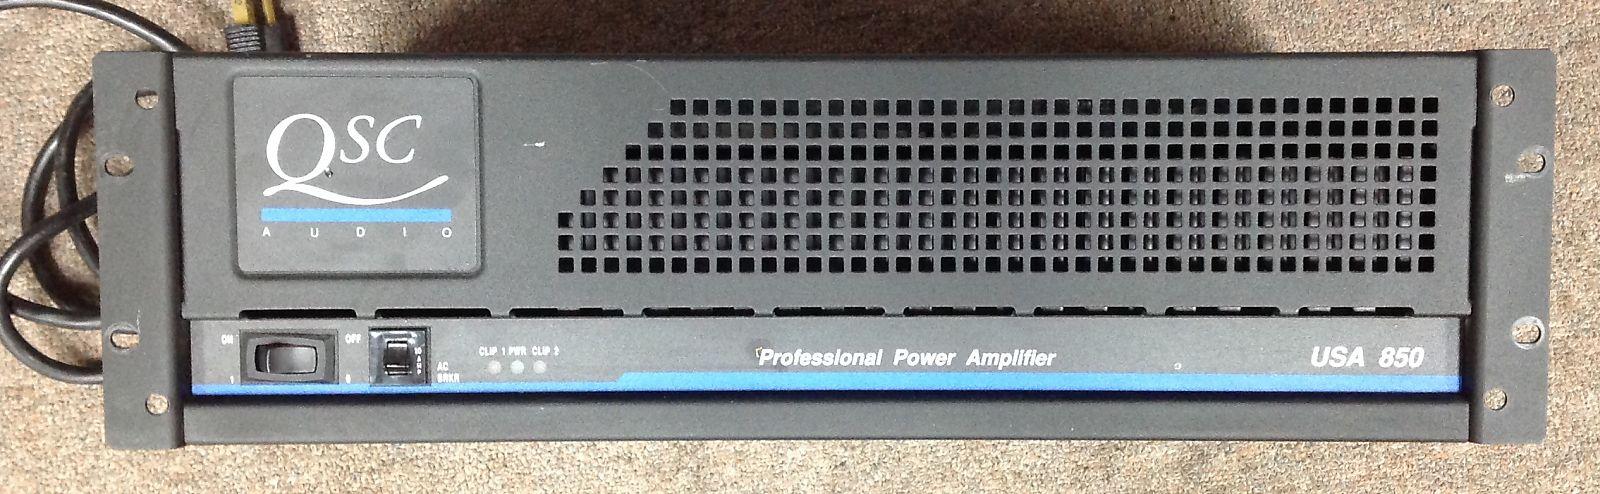 Qsc Usa 850 Professional Power Amplifier Amplifiers